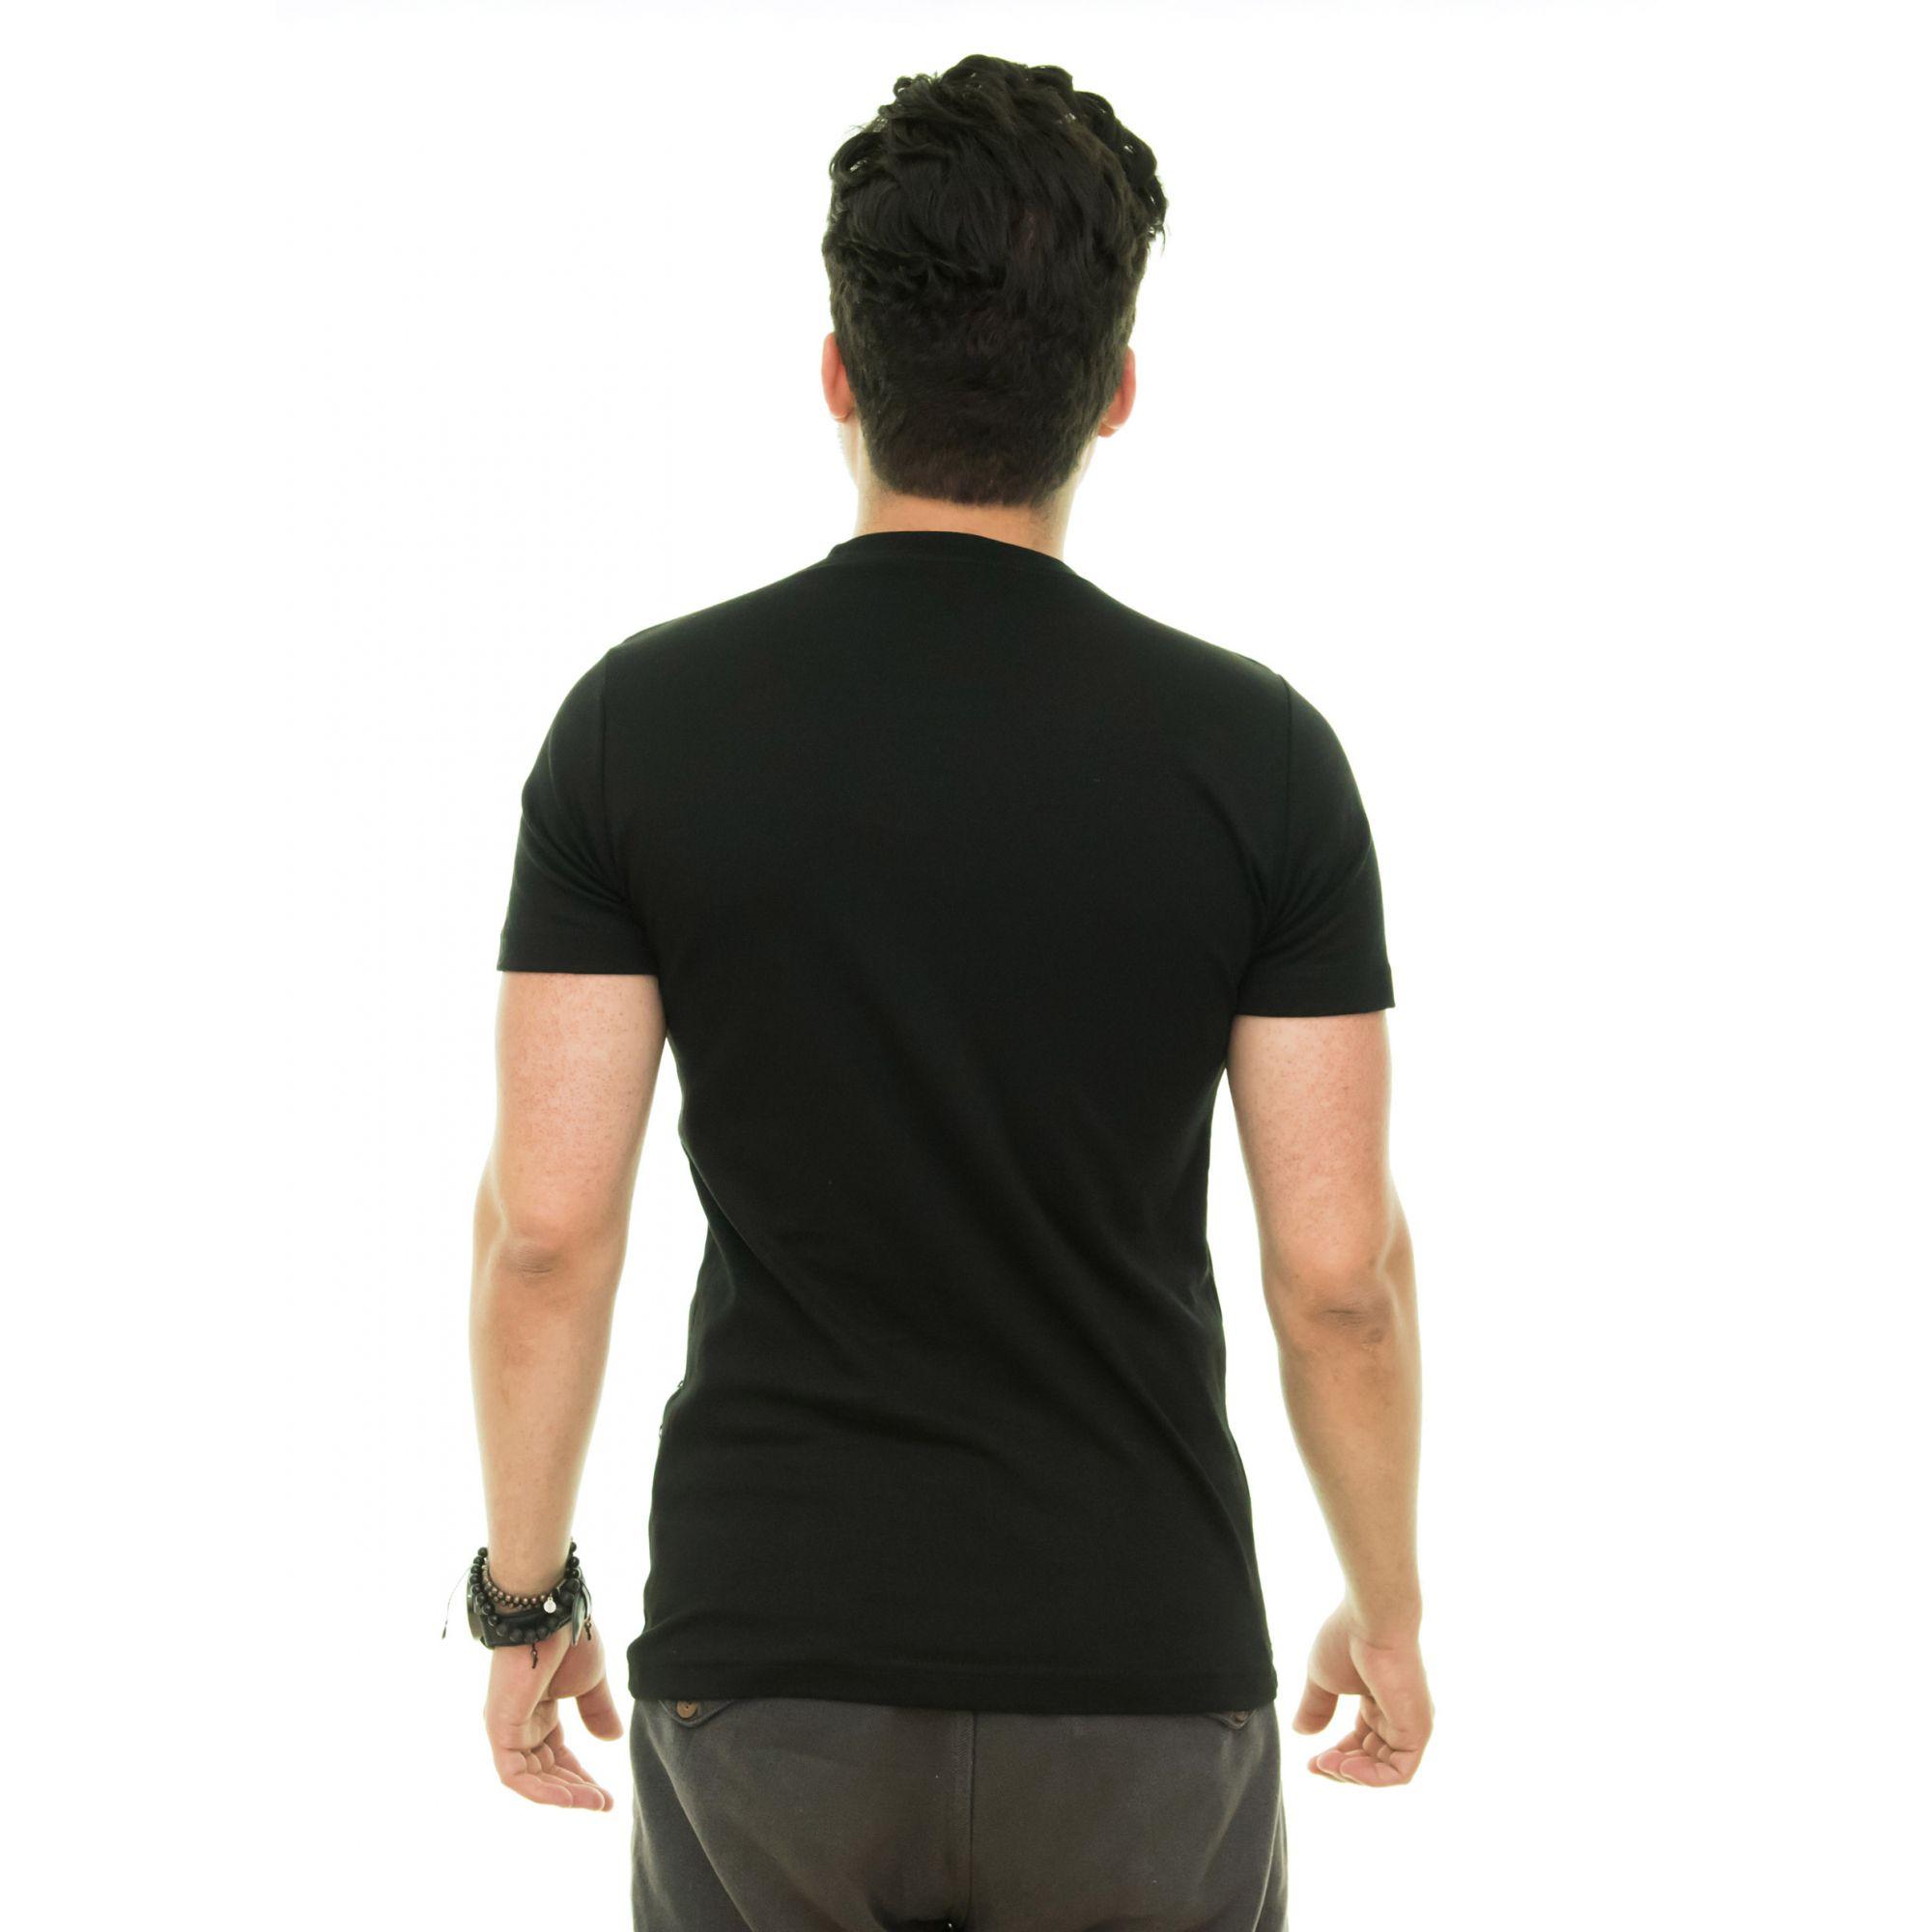 Camiseta Brb-02 Preta  - Ca Brasileira